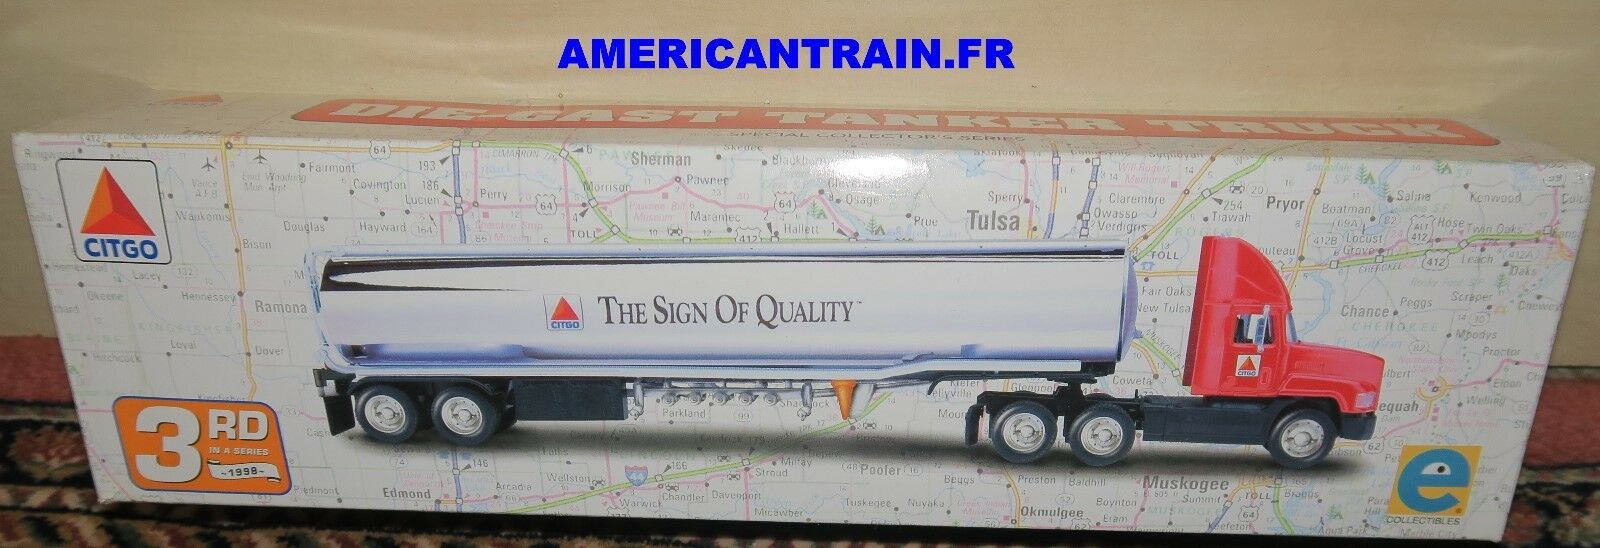 Camion-citerne Américain   Citgo The Sign of Quality   échelle O